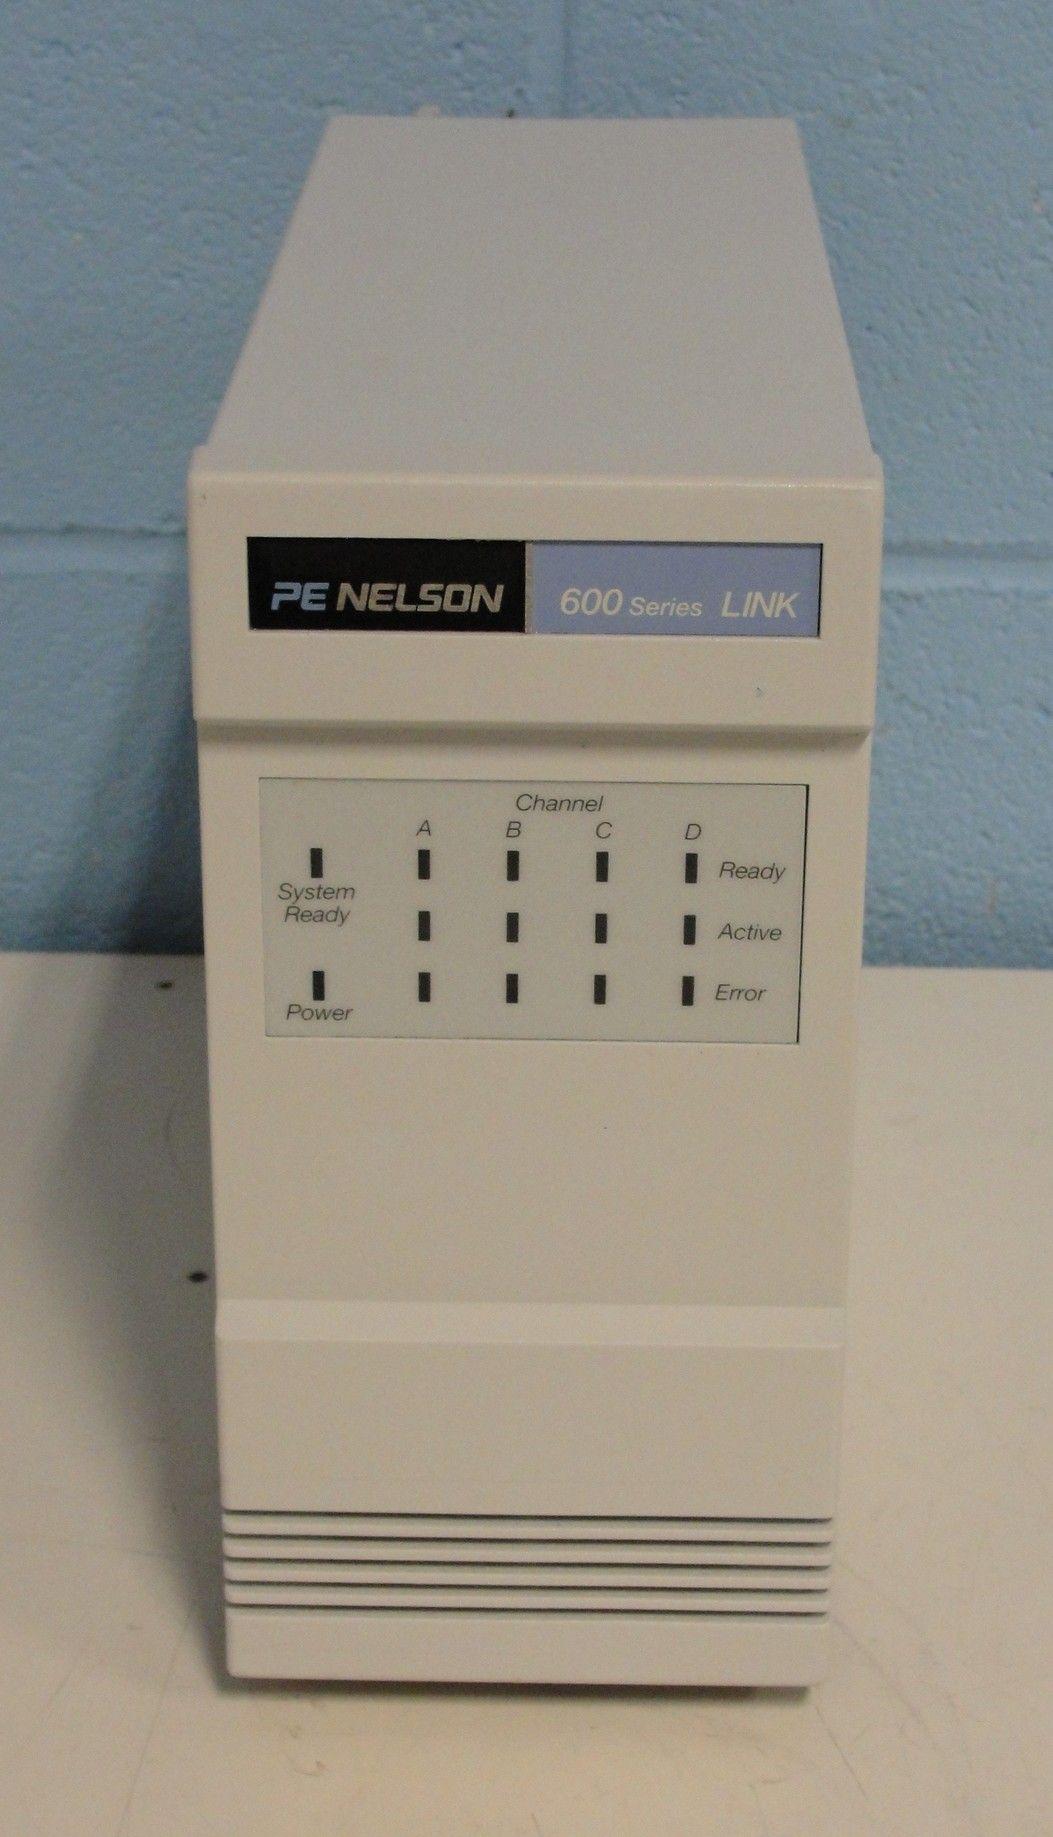 Perkin Elmer PE Nelson 600 Series Link Model 610